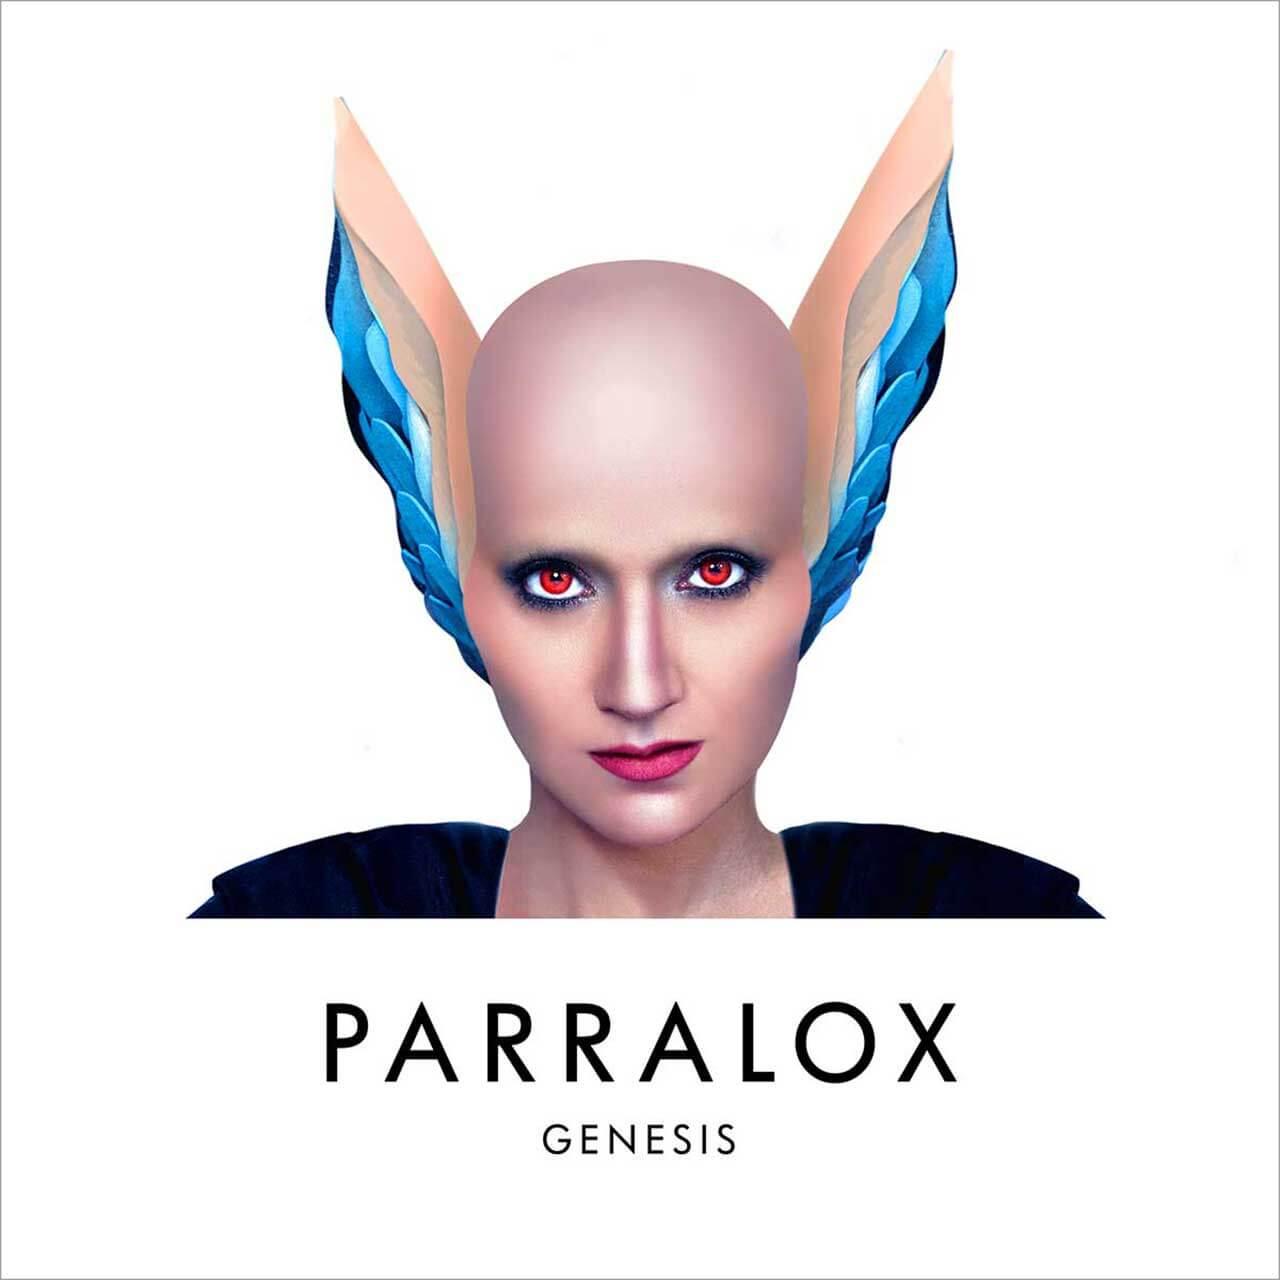 parralox genesis